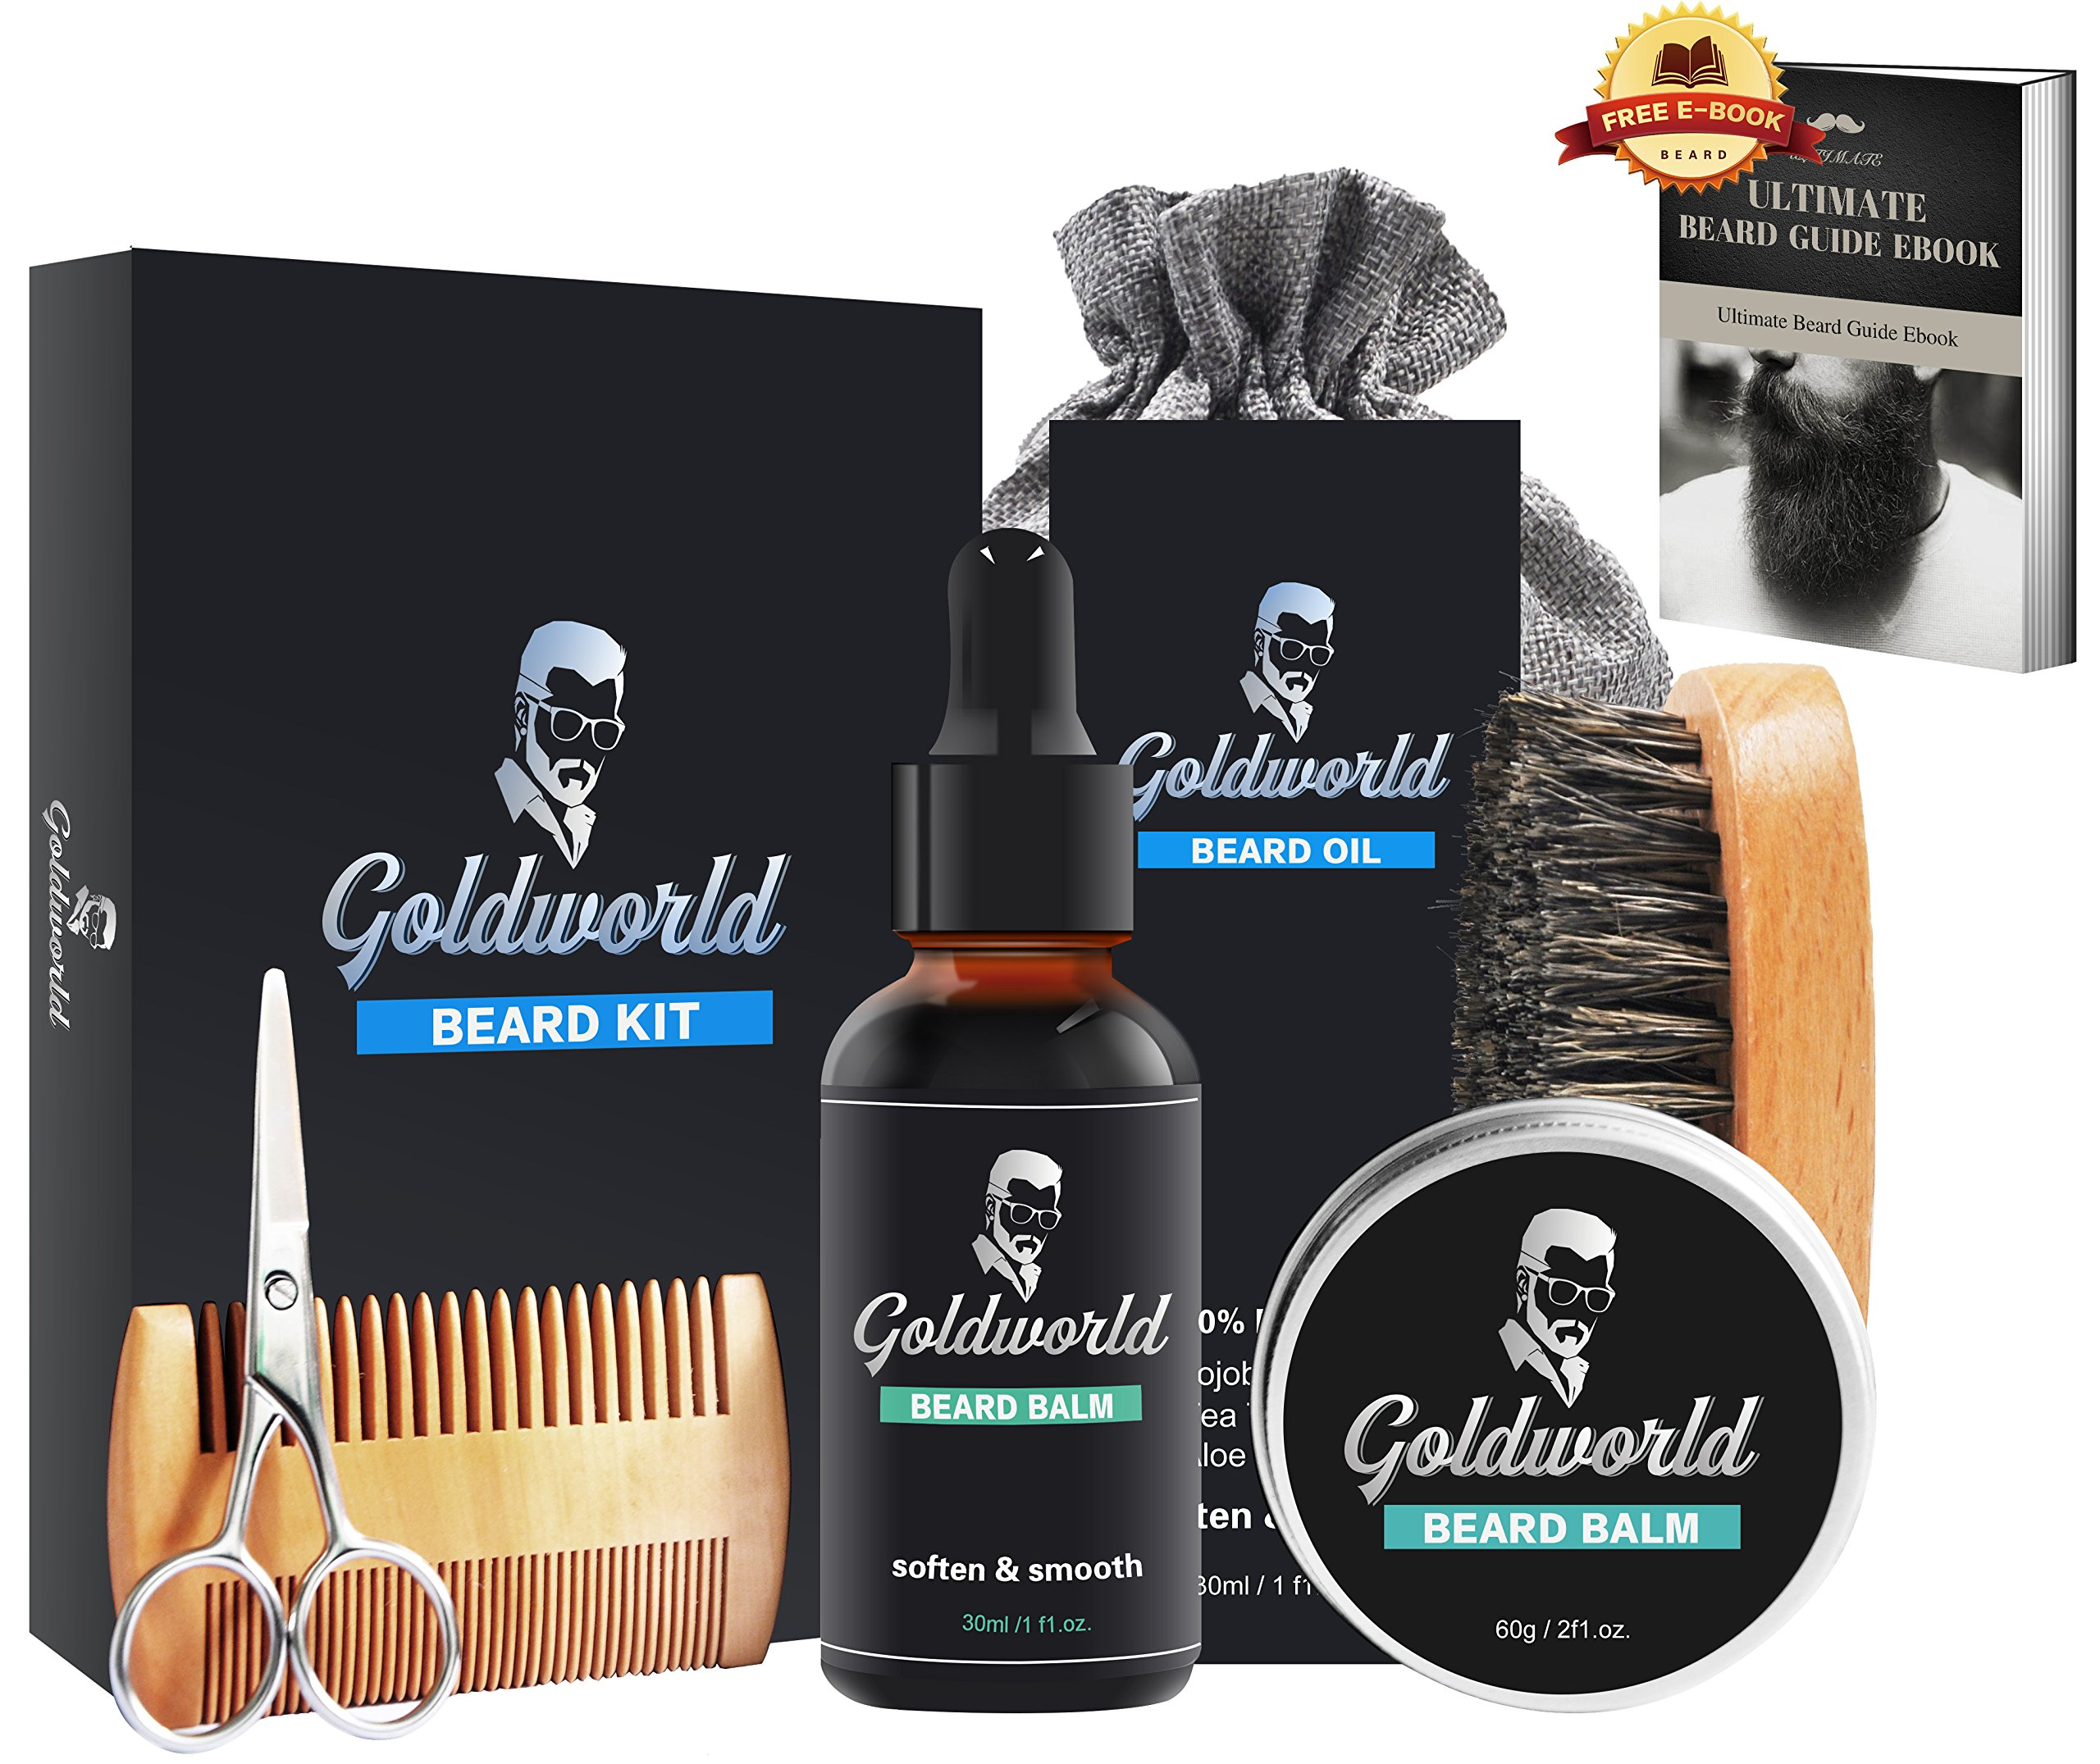 GoldWorld Beard Growth Kit for Dad/Men Gift Sets w/Unscented Beard Conditioner Oil+ Beard Balm Wax+Beard Comb+Beard Brush+Beard Scissors+Storage Bag for Grooming/Shaping (Beard Kit)